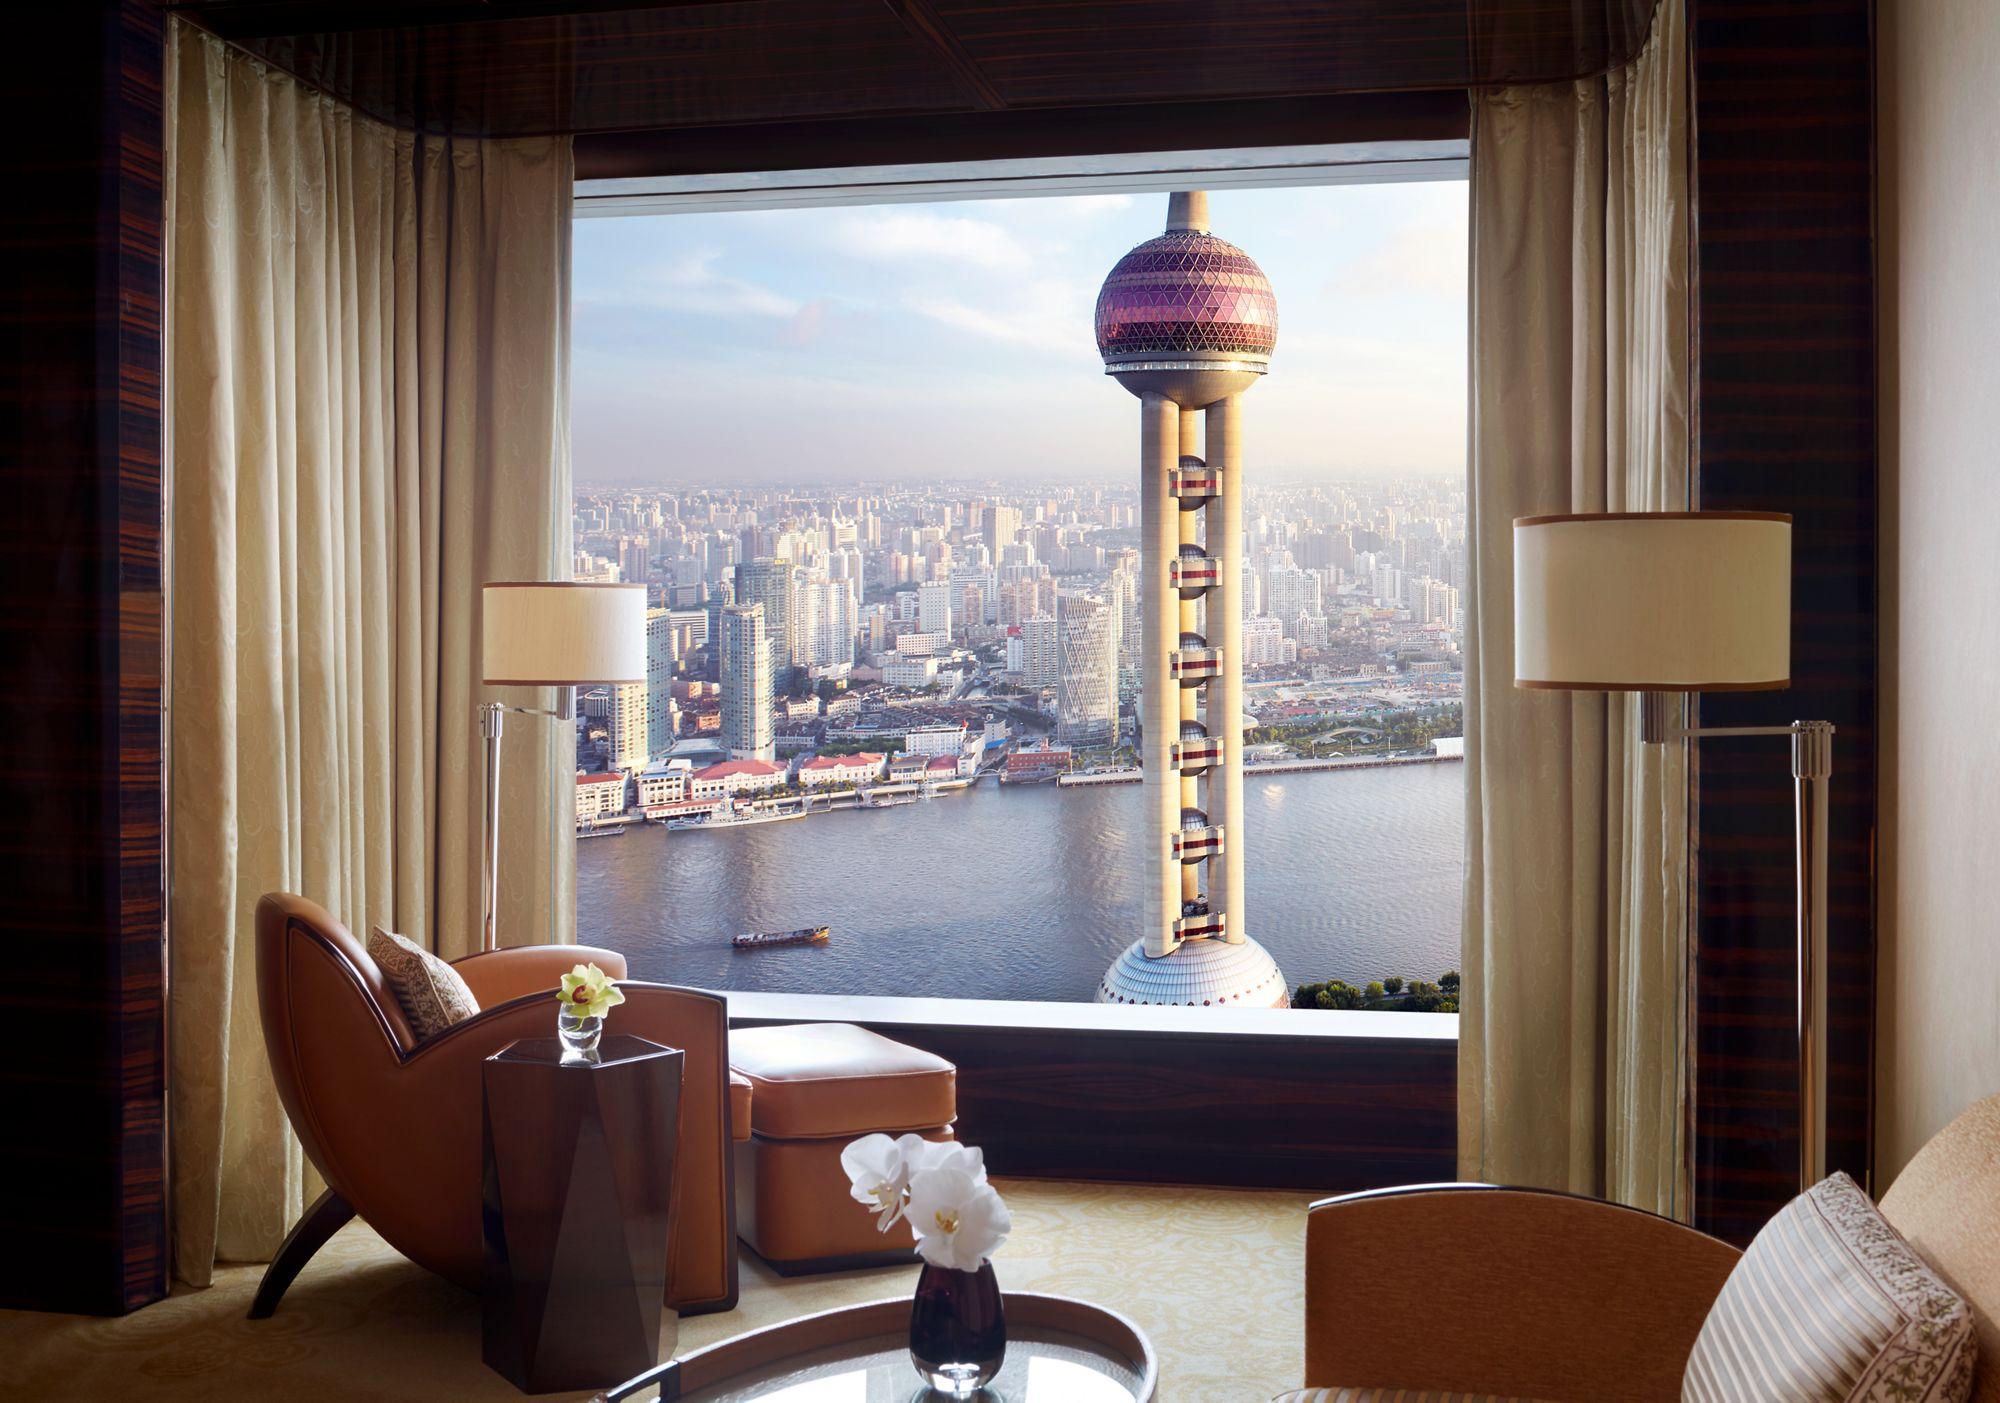 The Ritz-Carlton Room in Shanghai